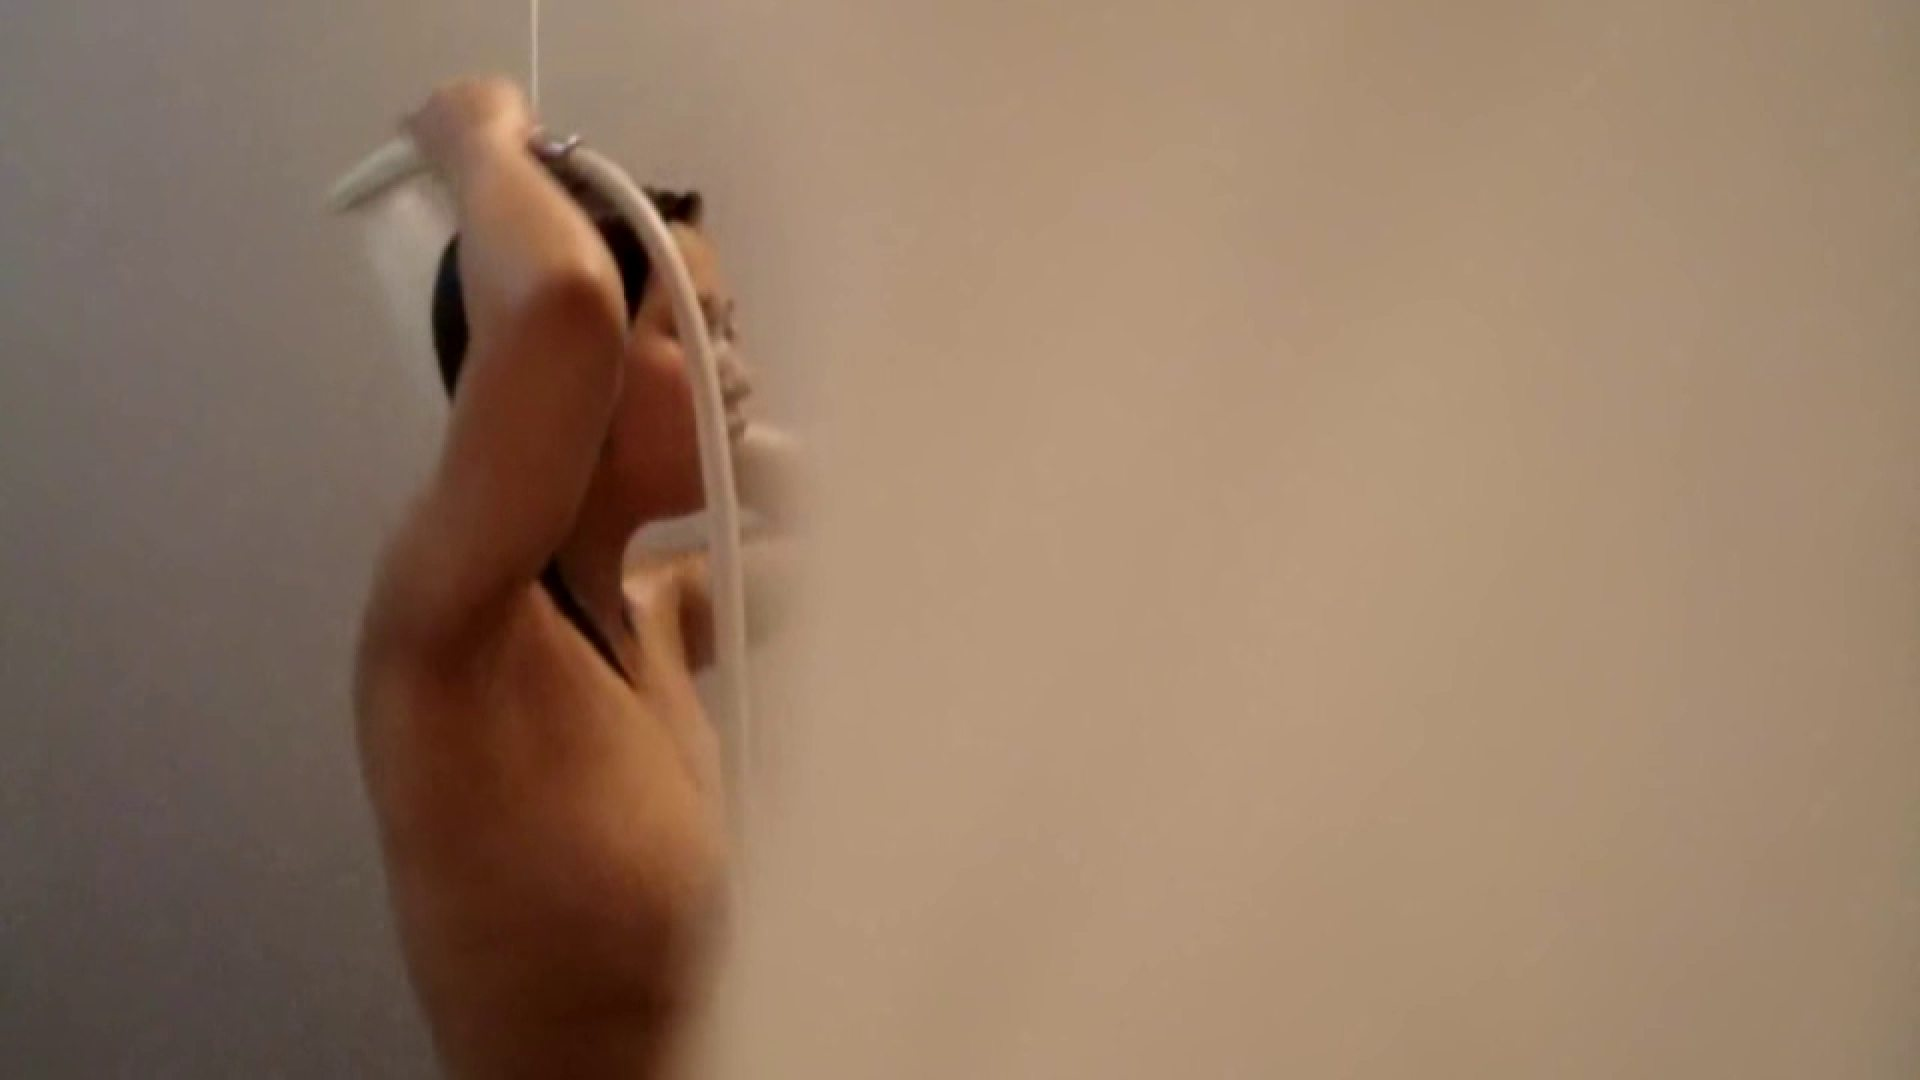 vol.2 葵のグラドル顔負けの爆乳を入浴シーンでどうぞ。 爆乳 すけべAV動画紹介 64PIX 15